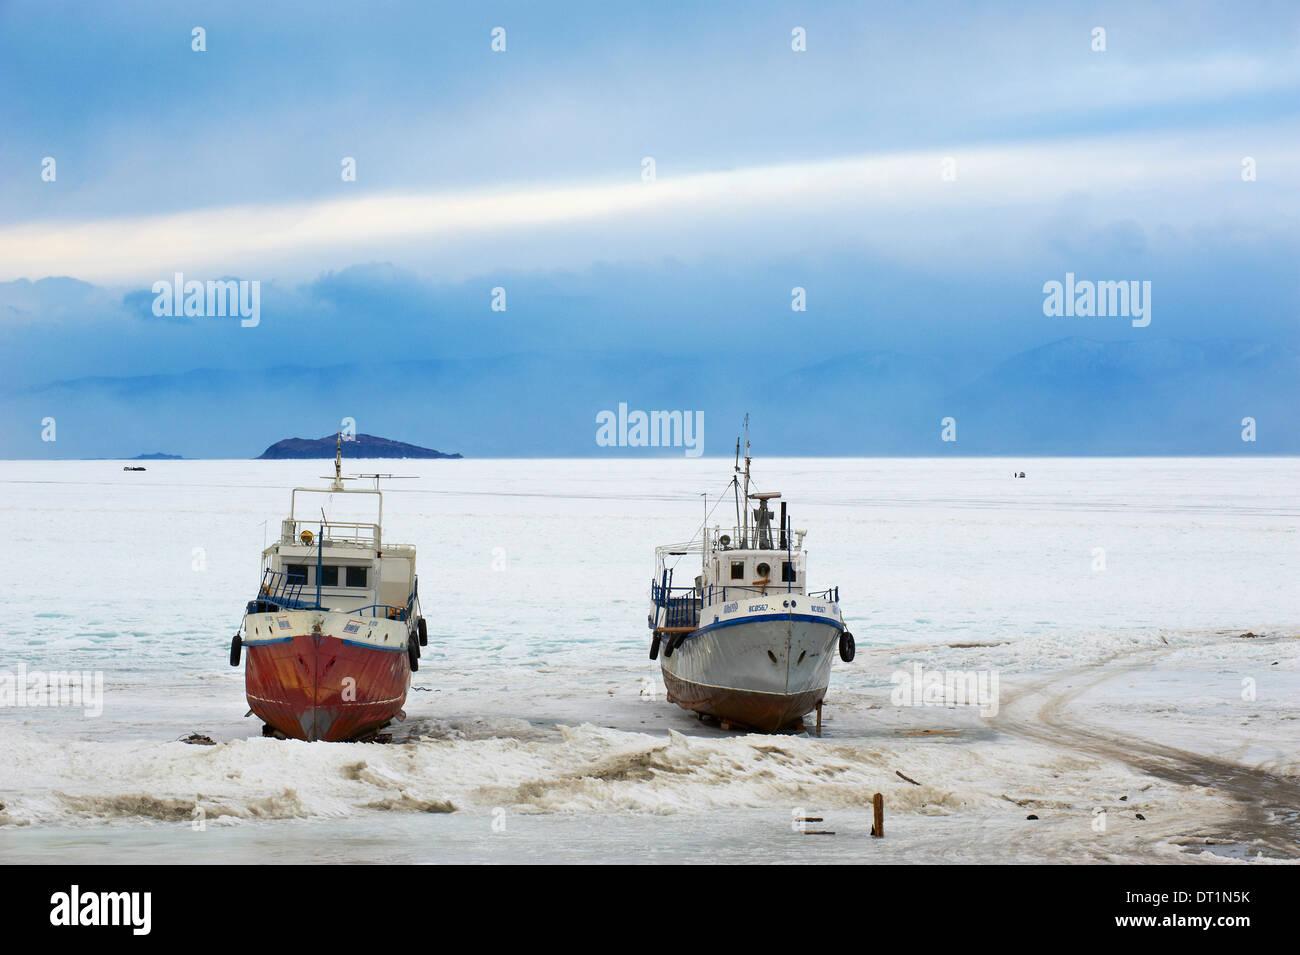 Frozen Harbour of Khoujir, Maloe More (Little Sea), Olkhon island, Lake Baikal, UNESCO Site, Irkutsk Oblast, Siberia, Russia - Stock Image